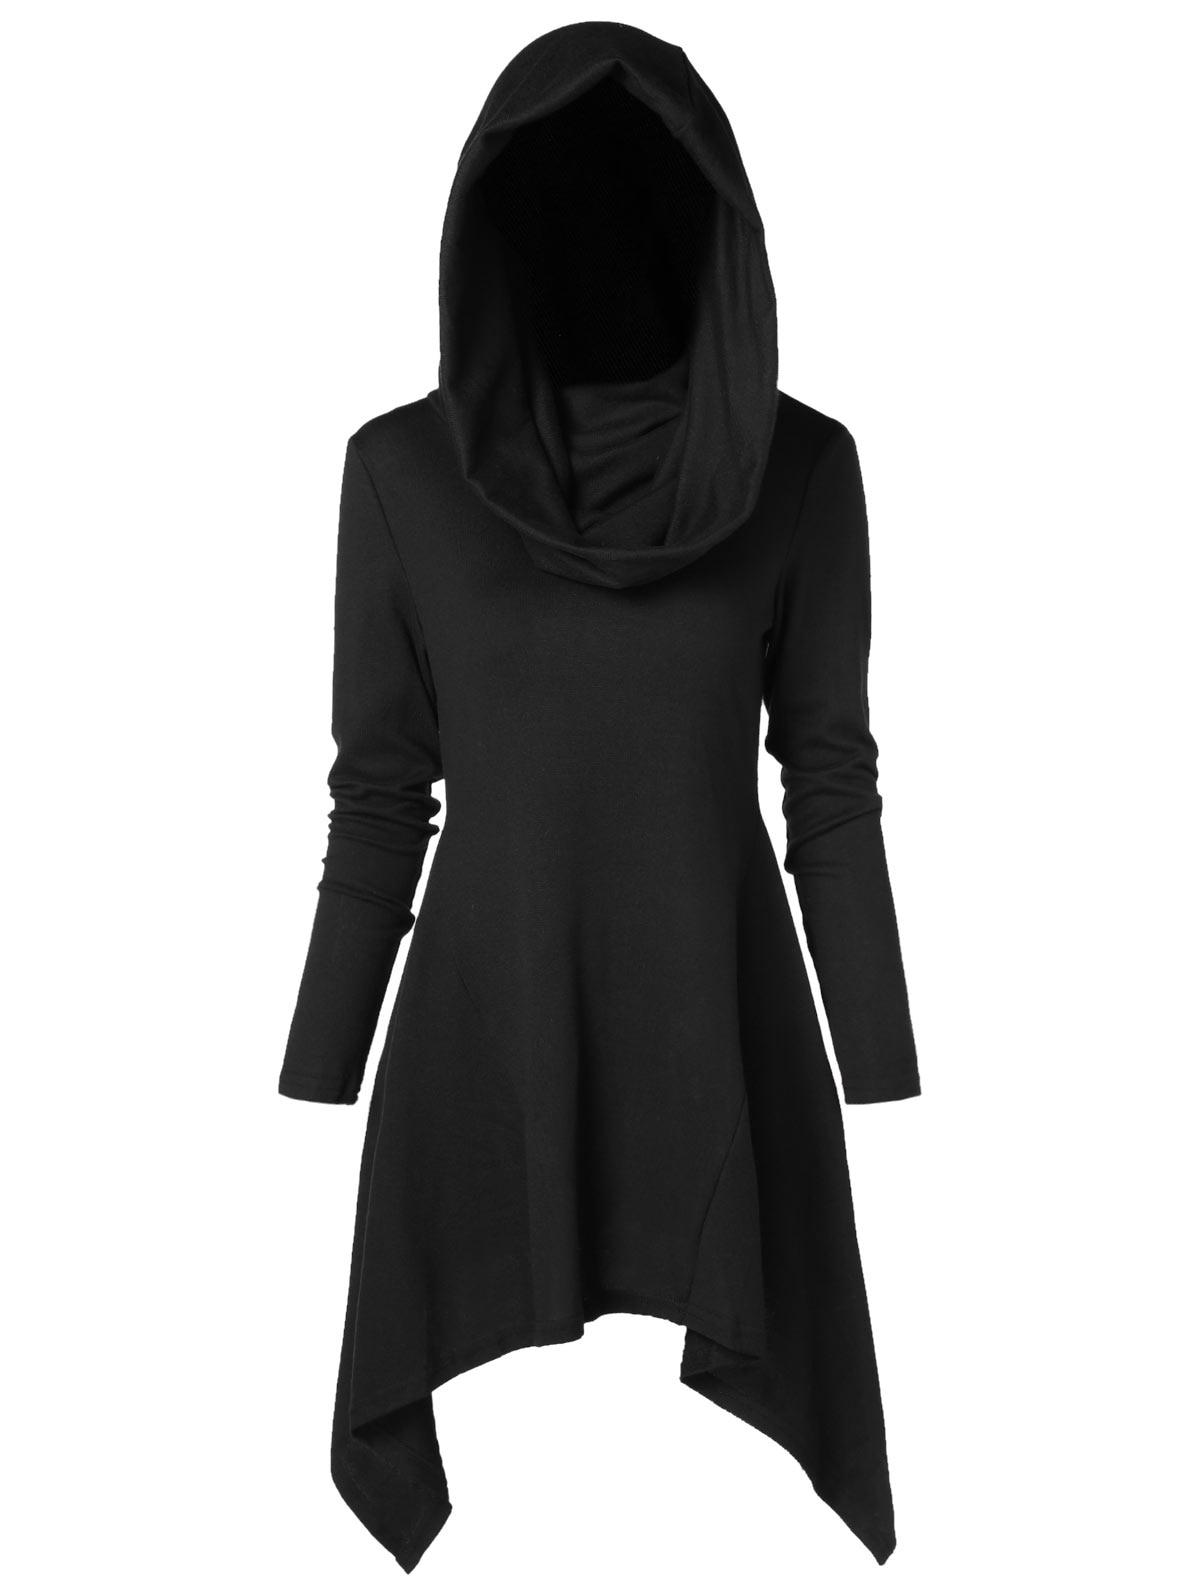 Wipalo 2018 Fall Winter Women Hooded Long Sleeves Asymmetrical Knitwear Casual Solid Pullovers Sweatshirts Ladies Hoodies Tops